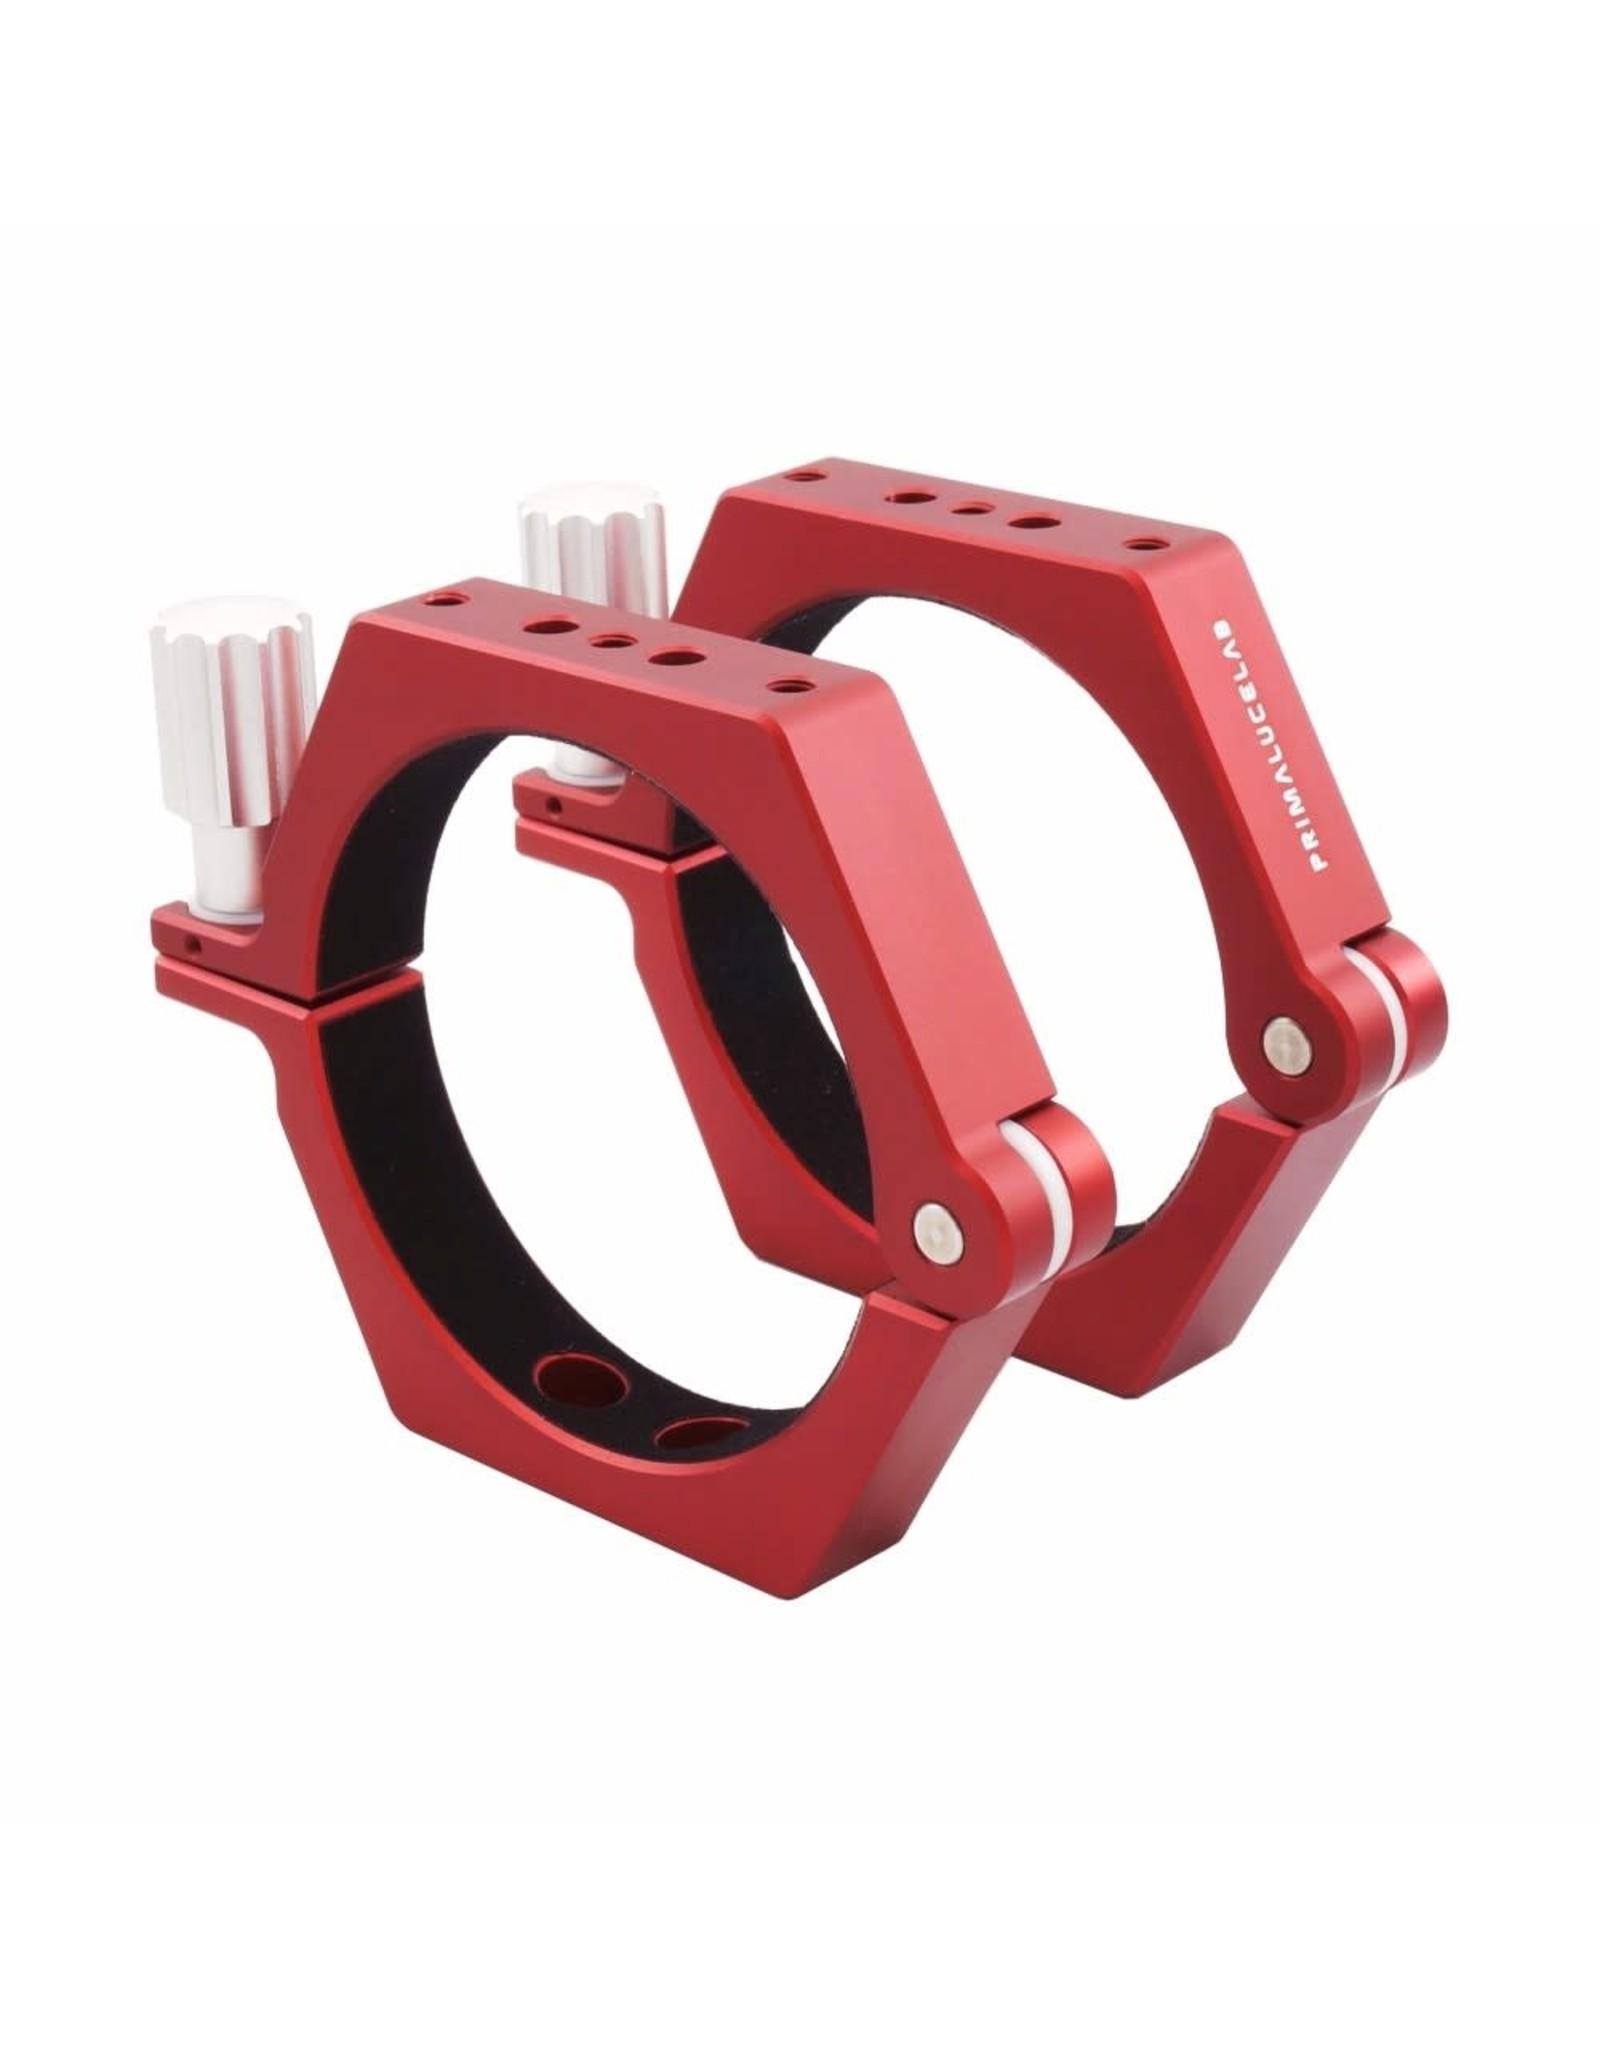 PrimaLuceLab PrimaluceLab PLUS Mounting Rings (Specify Diameter)